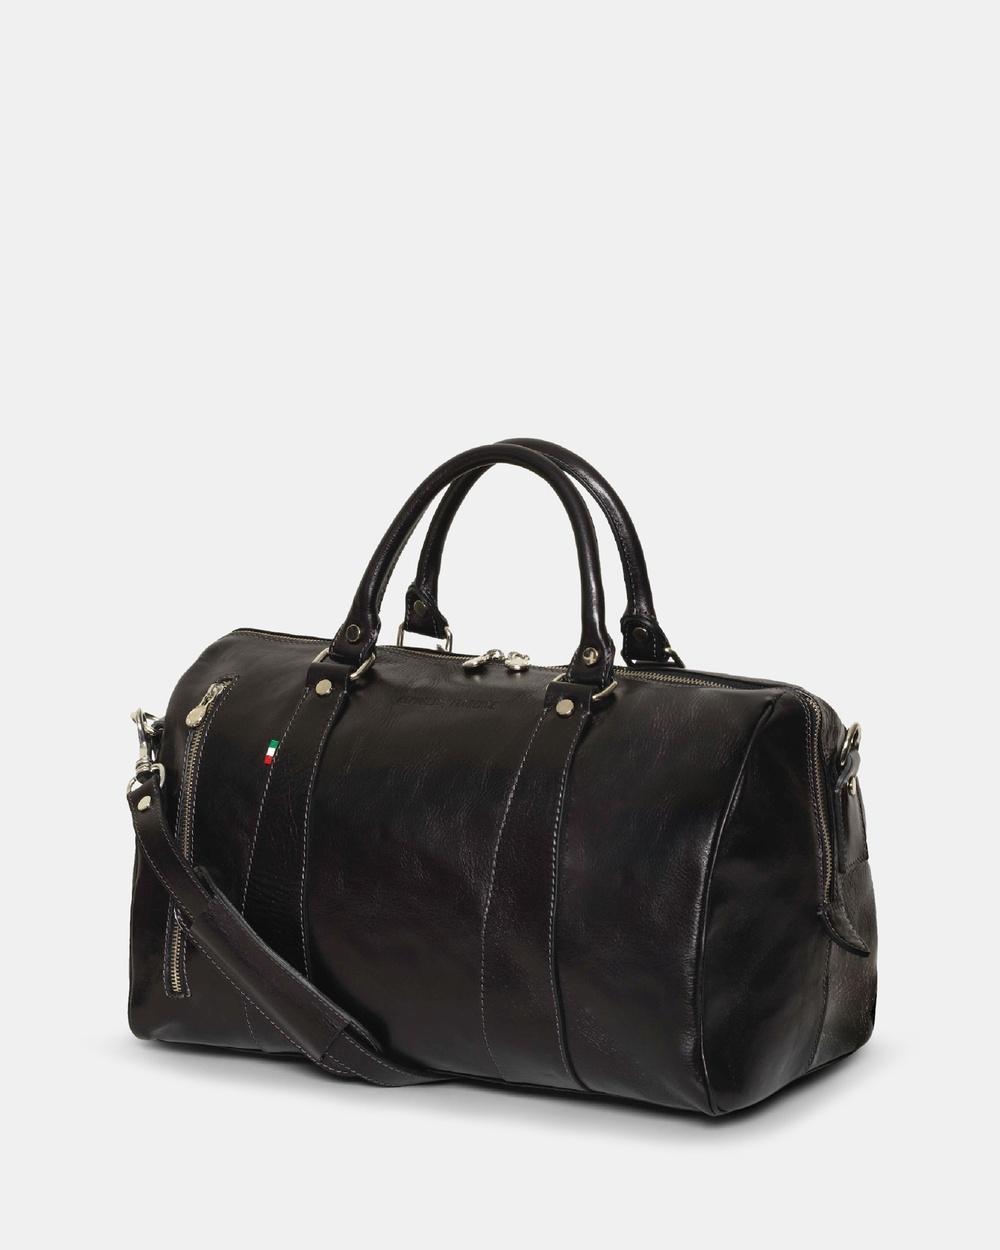 Republic of Florence Small Nardi Weekender Duffle Bags Black